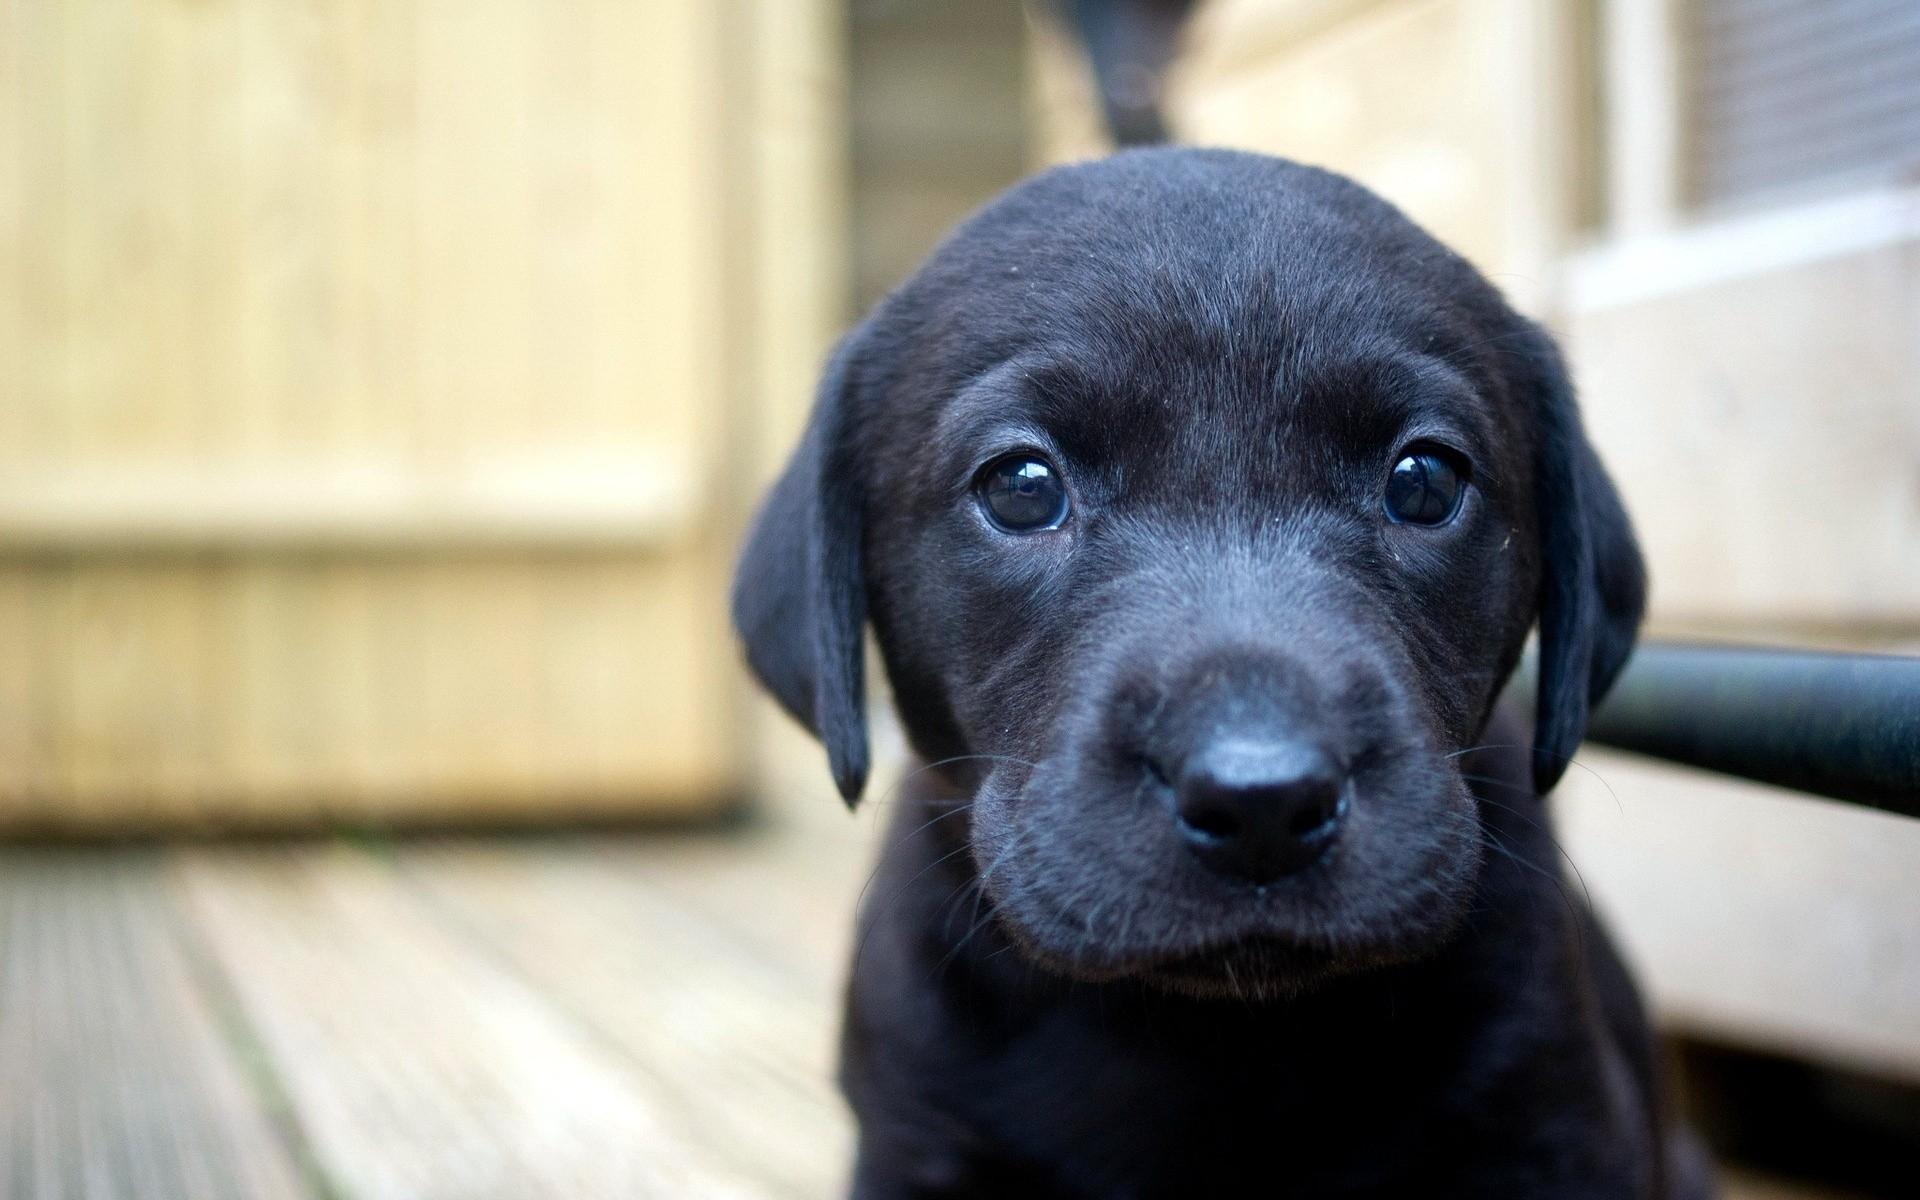 puppy_dog_face_eyes_44638_1920x1200.jpg